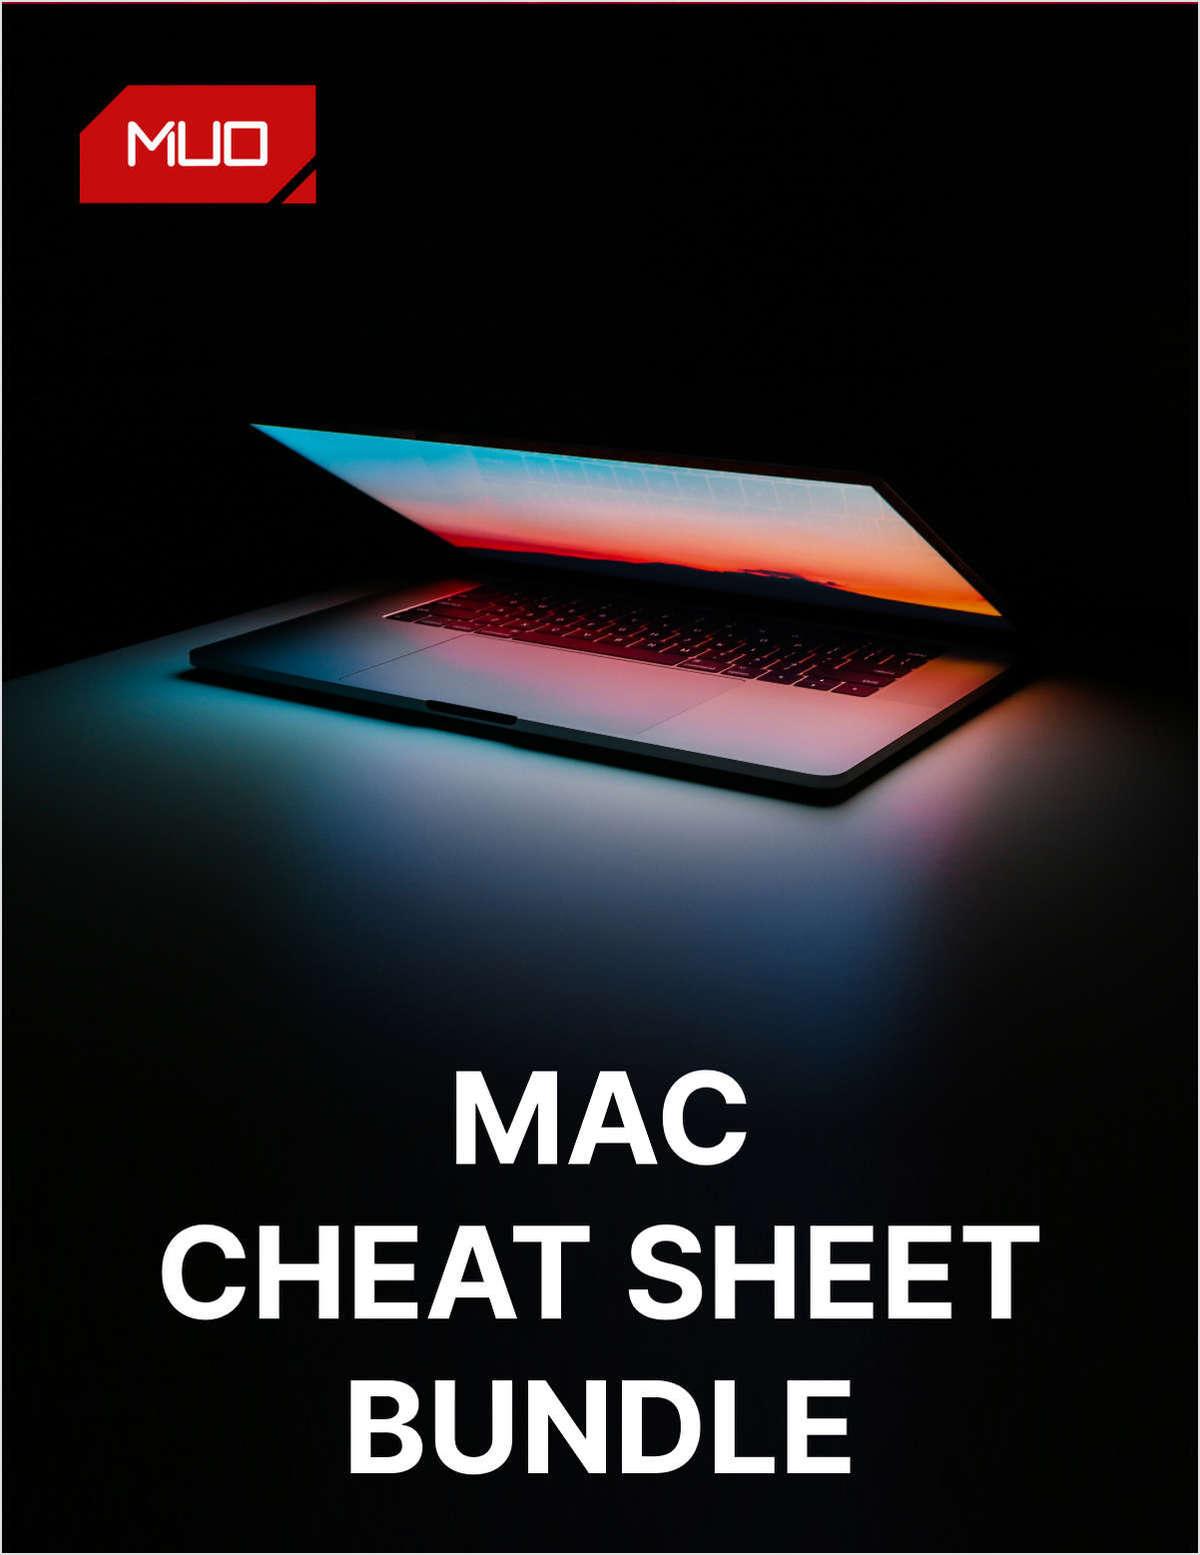 Mac Cheat Sheet Bundle